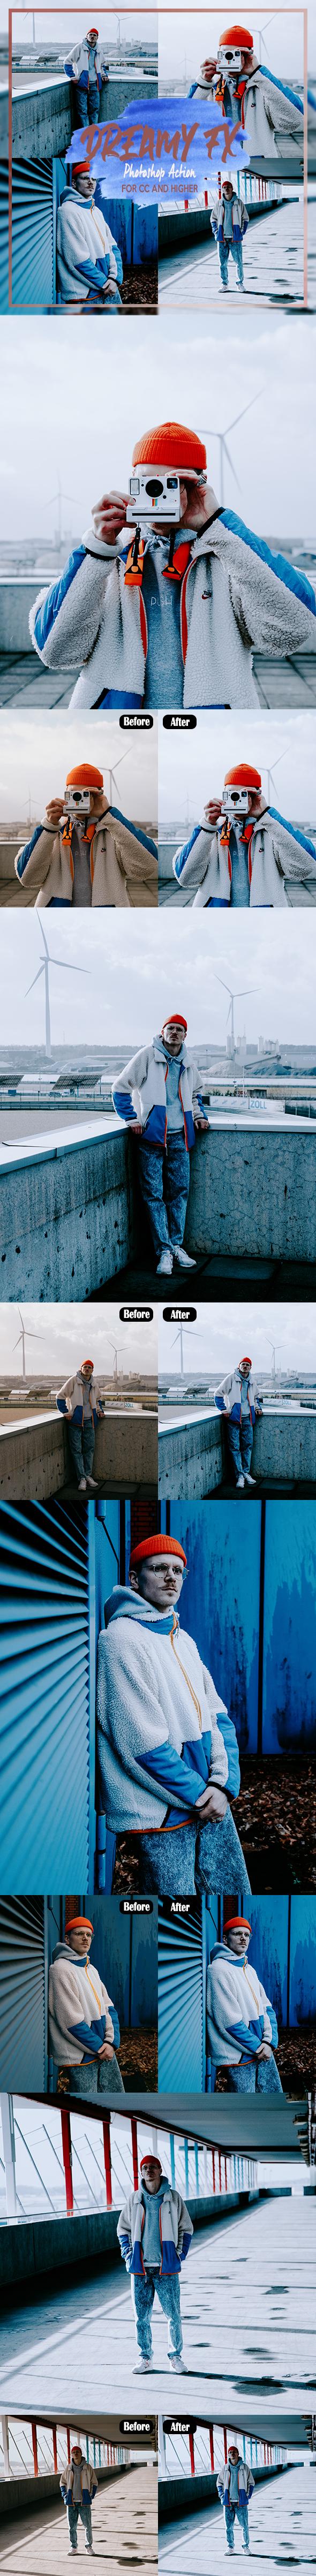 DREAMY fx - Photoshop Action